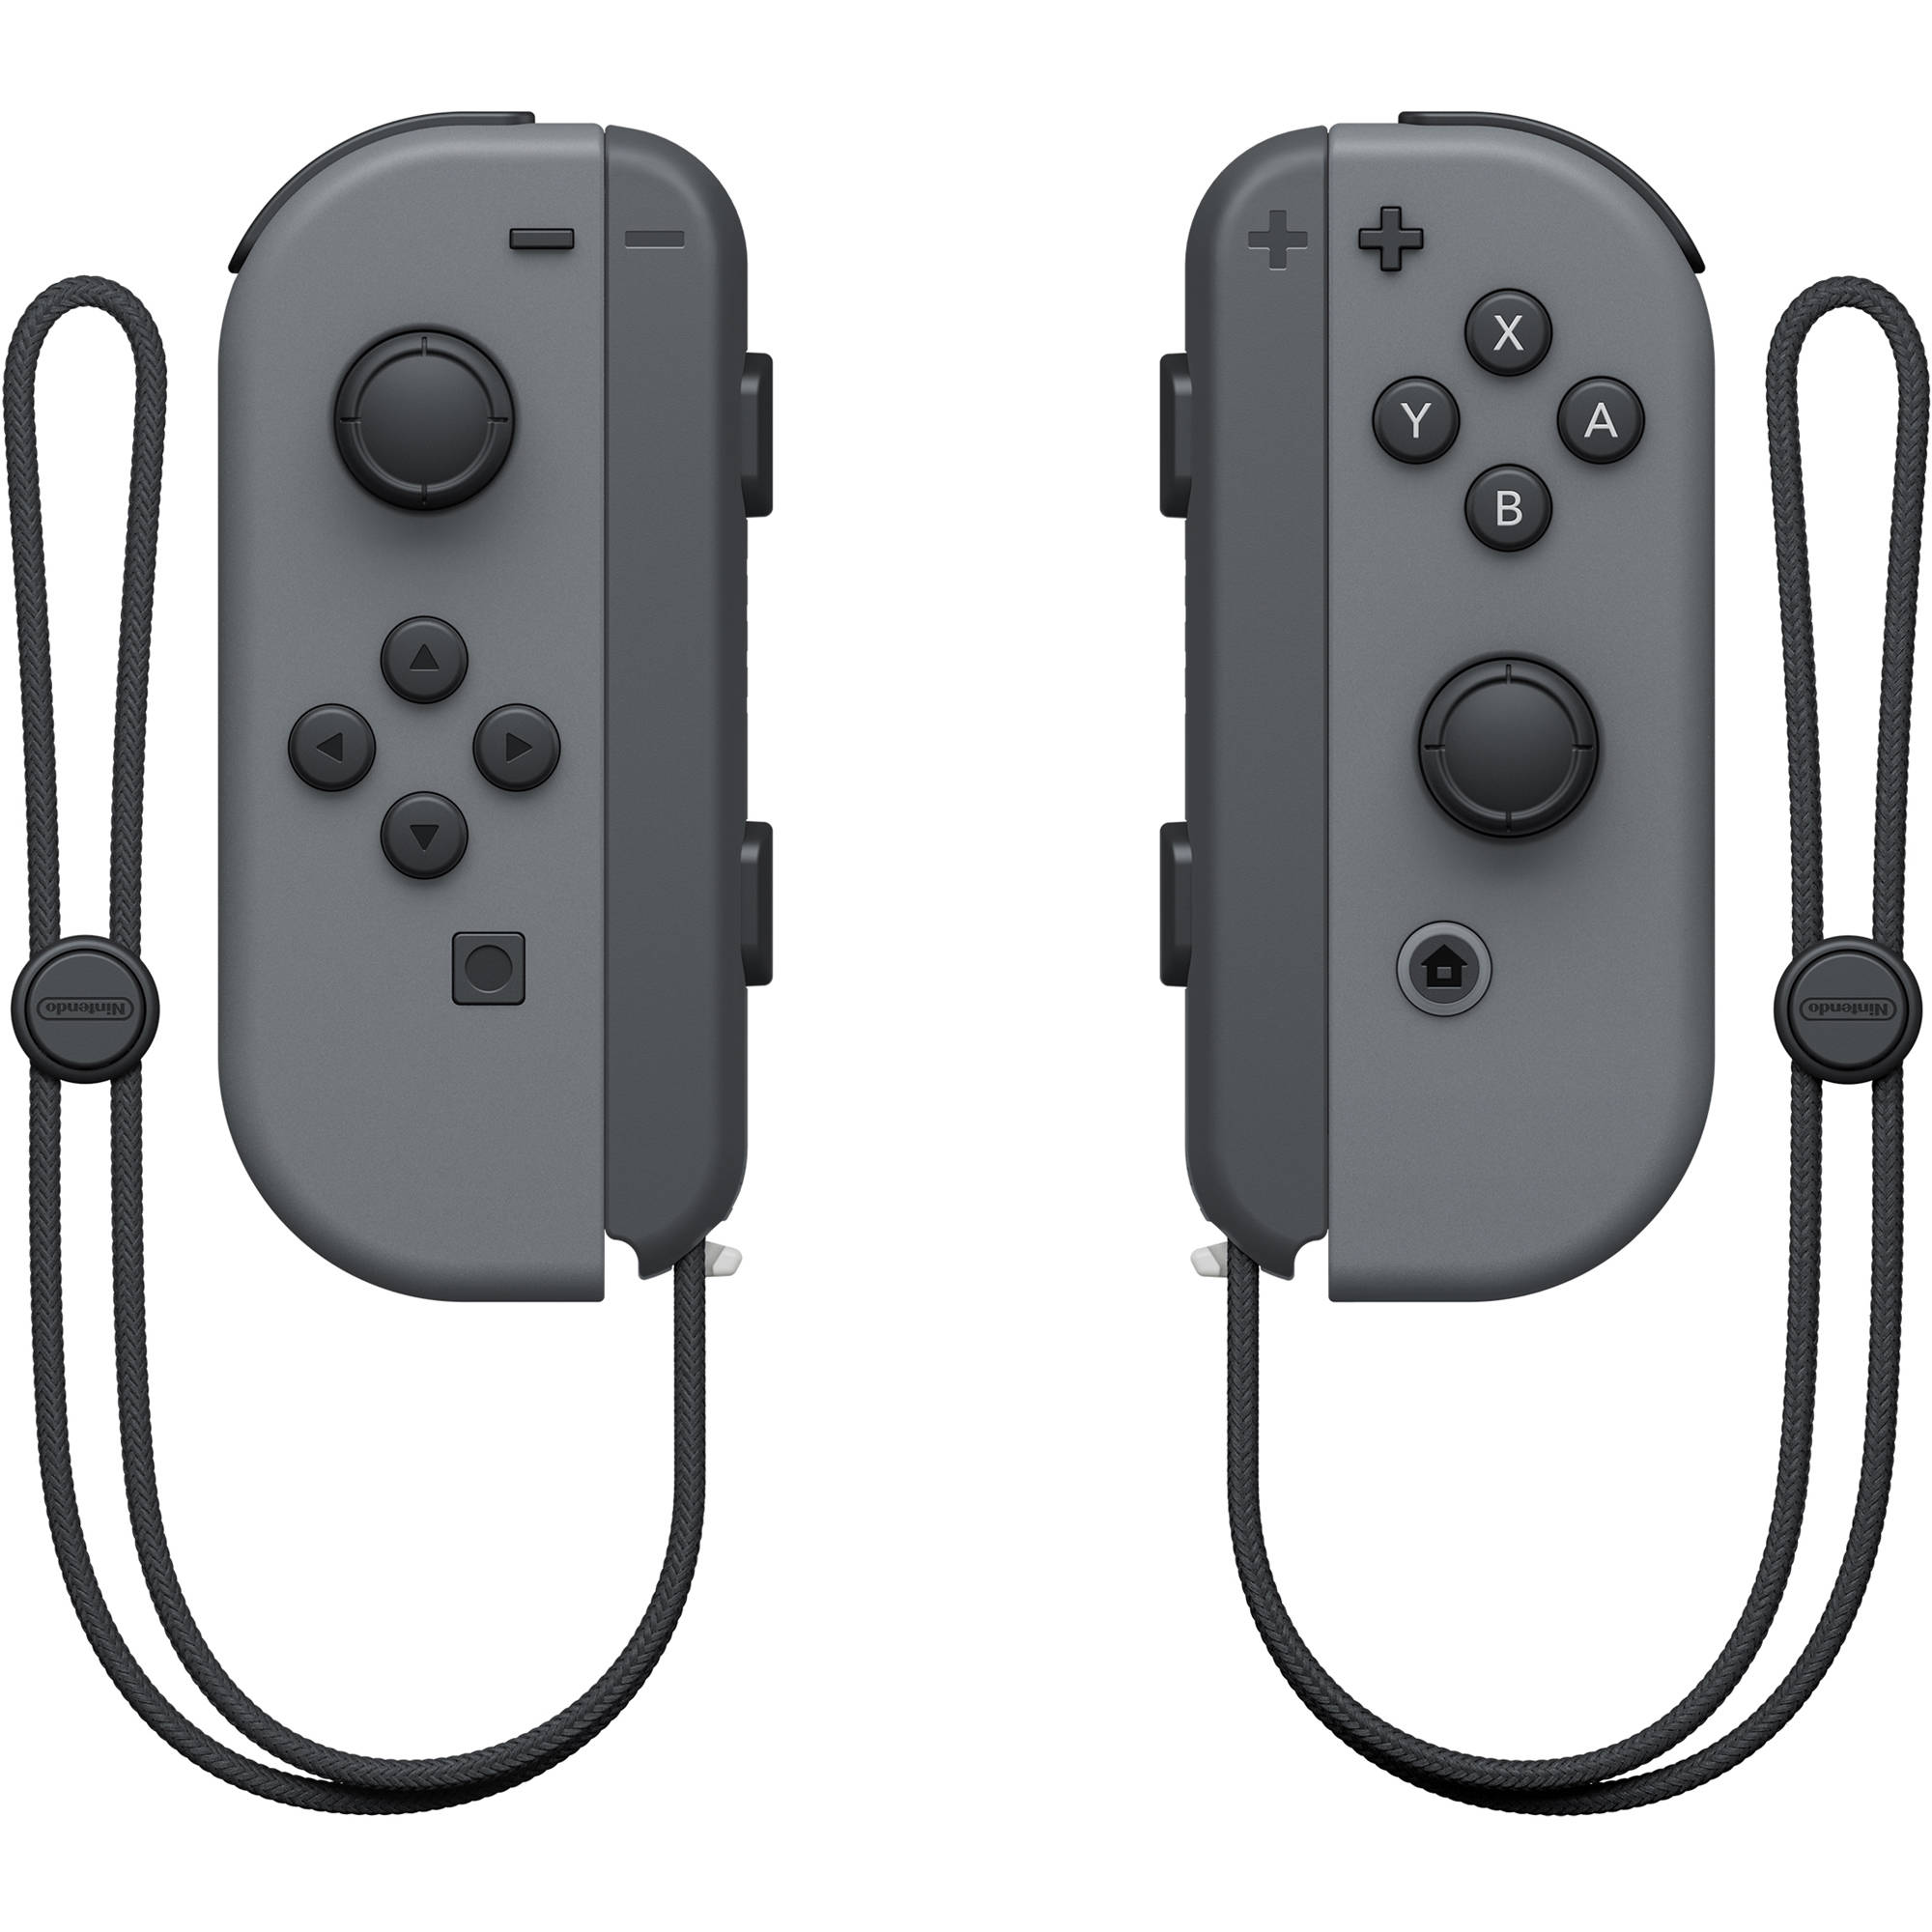 Nintendo Switch Bh Photo Video Grey Bundle 2game 2amiibo Joy Con Controllers Gray